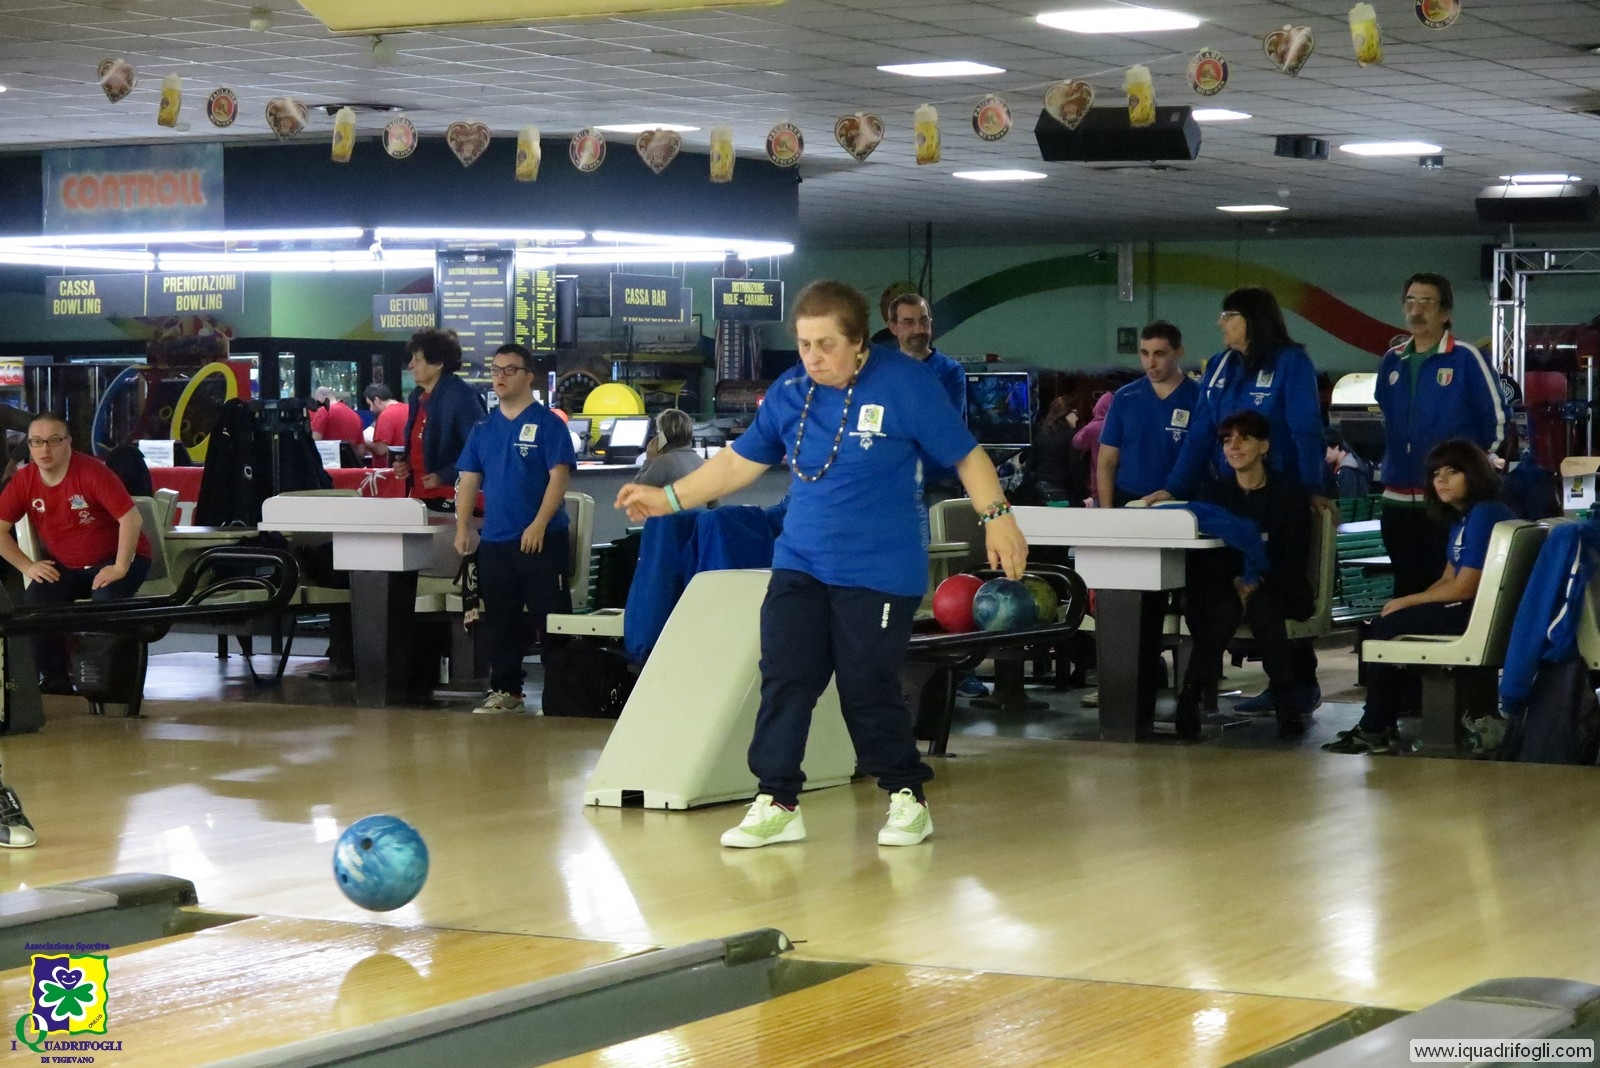 Bowling Nerviano 2019 - Regionali - 114